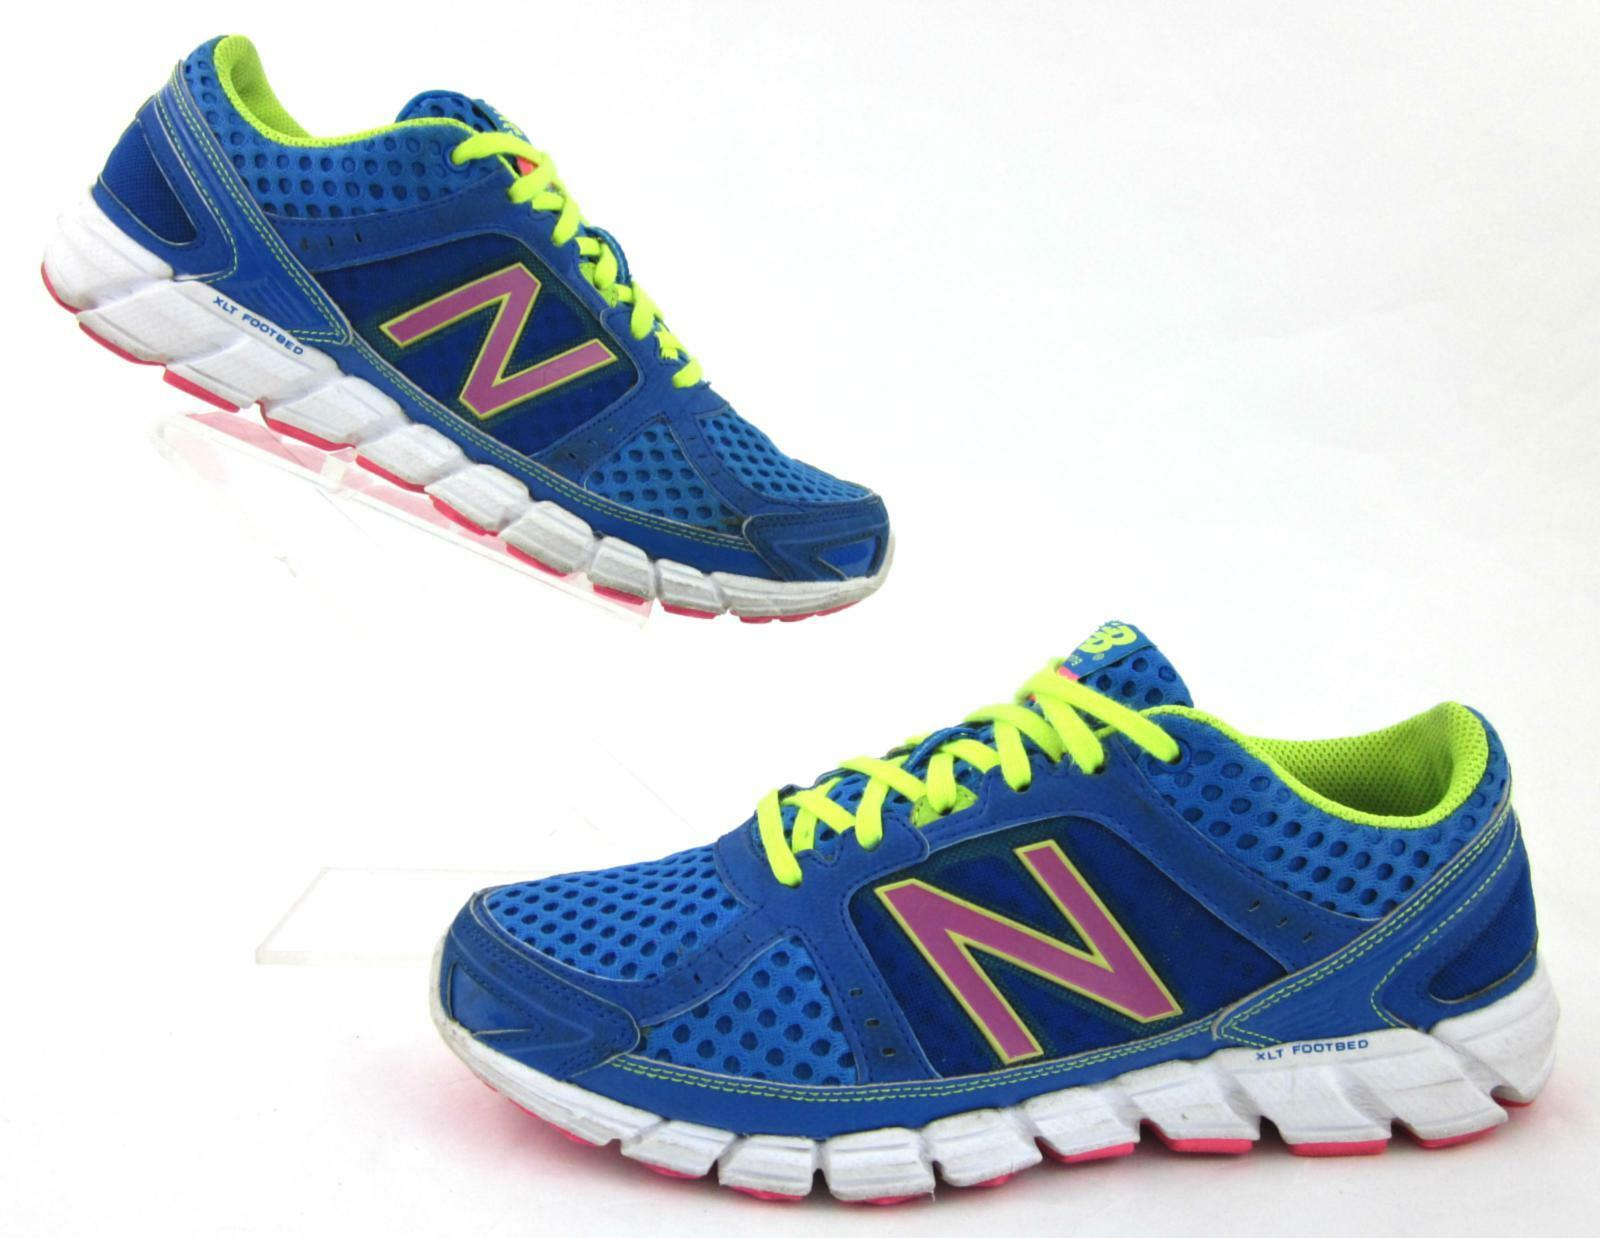 New Balance 750v1 Womens Running shoes Royal bluee   Neon   Purple US 8B